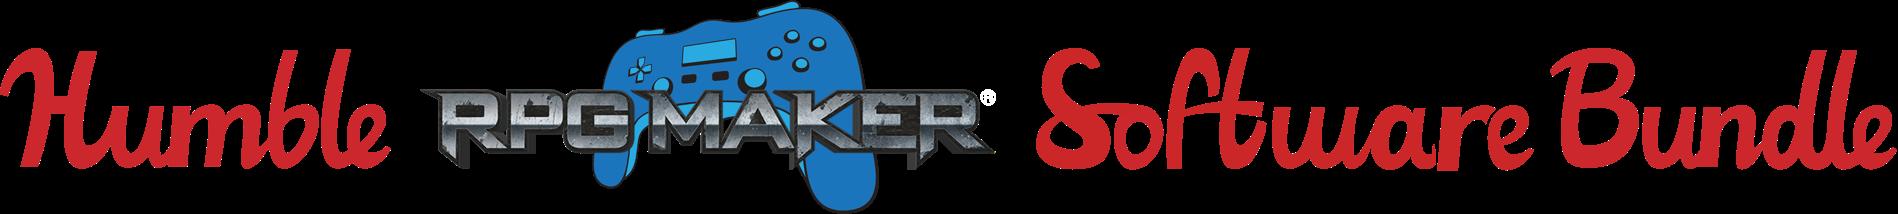 The Humble RPG Maker Software Bundle